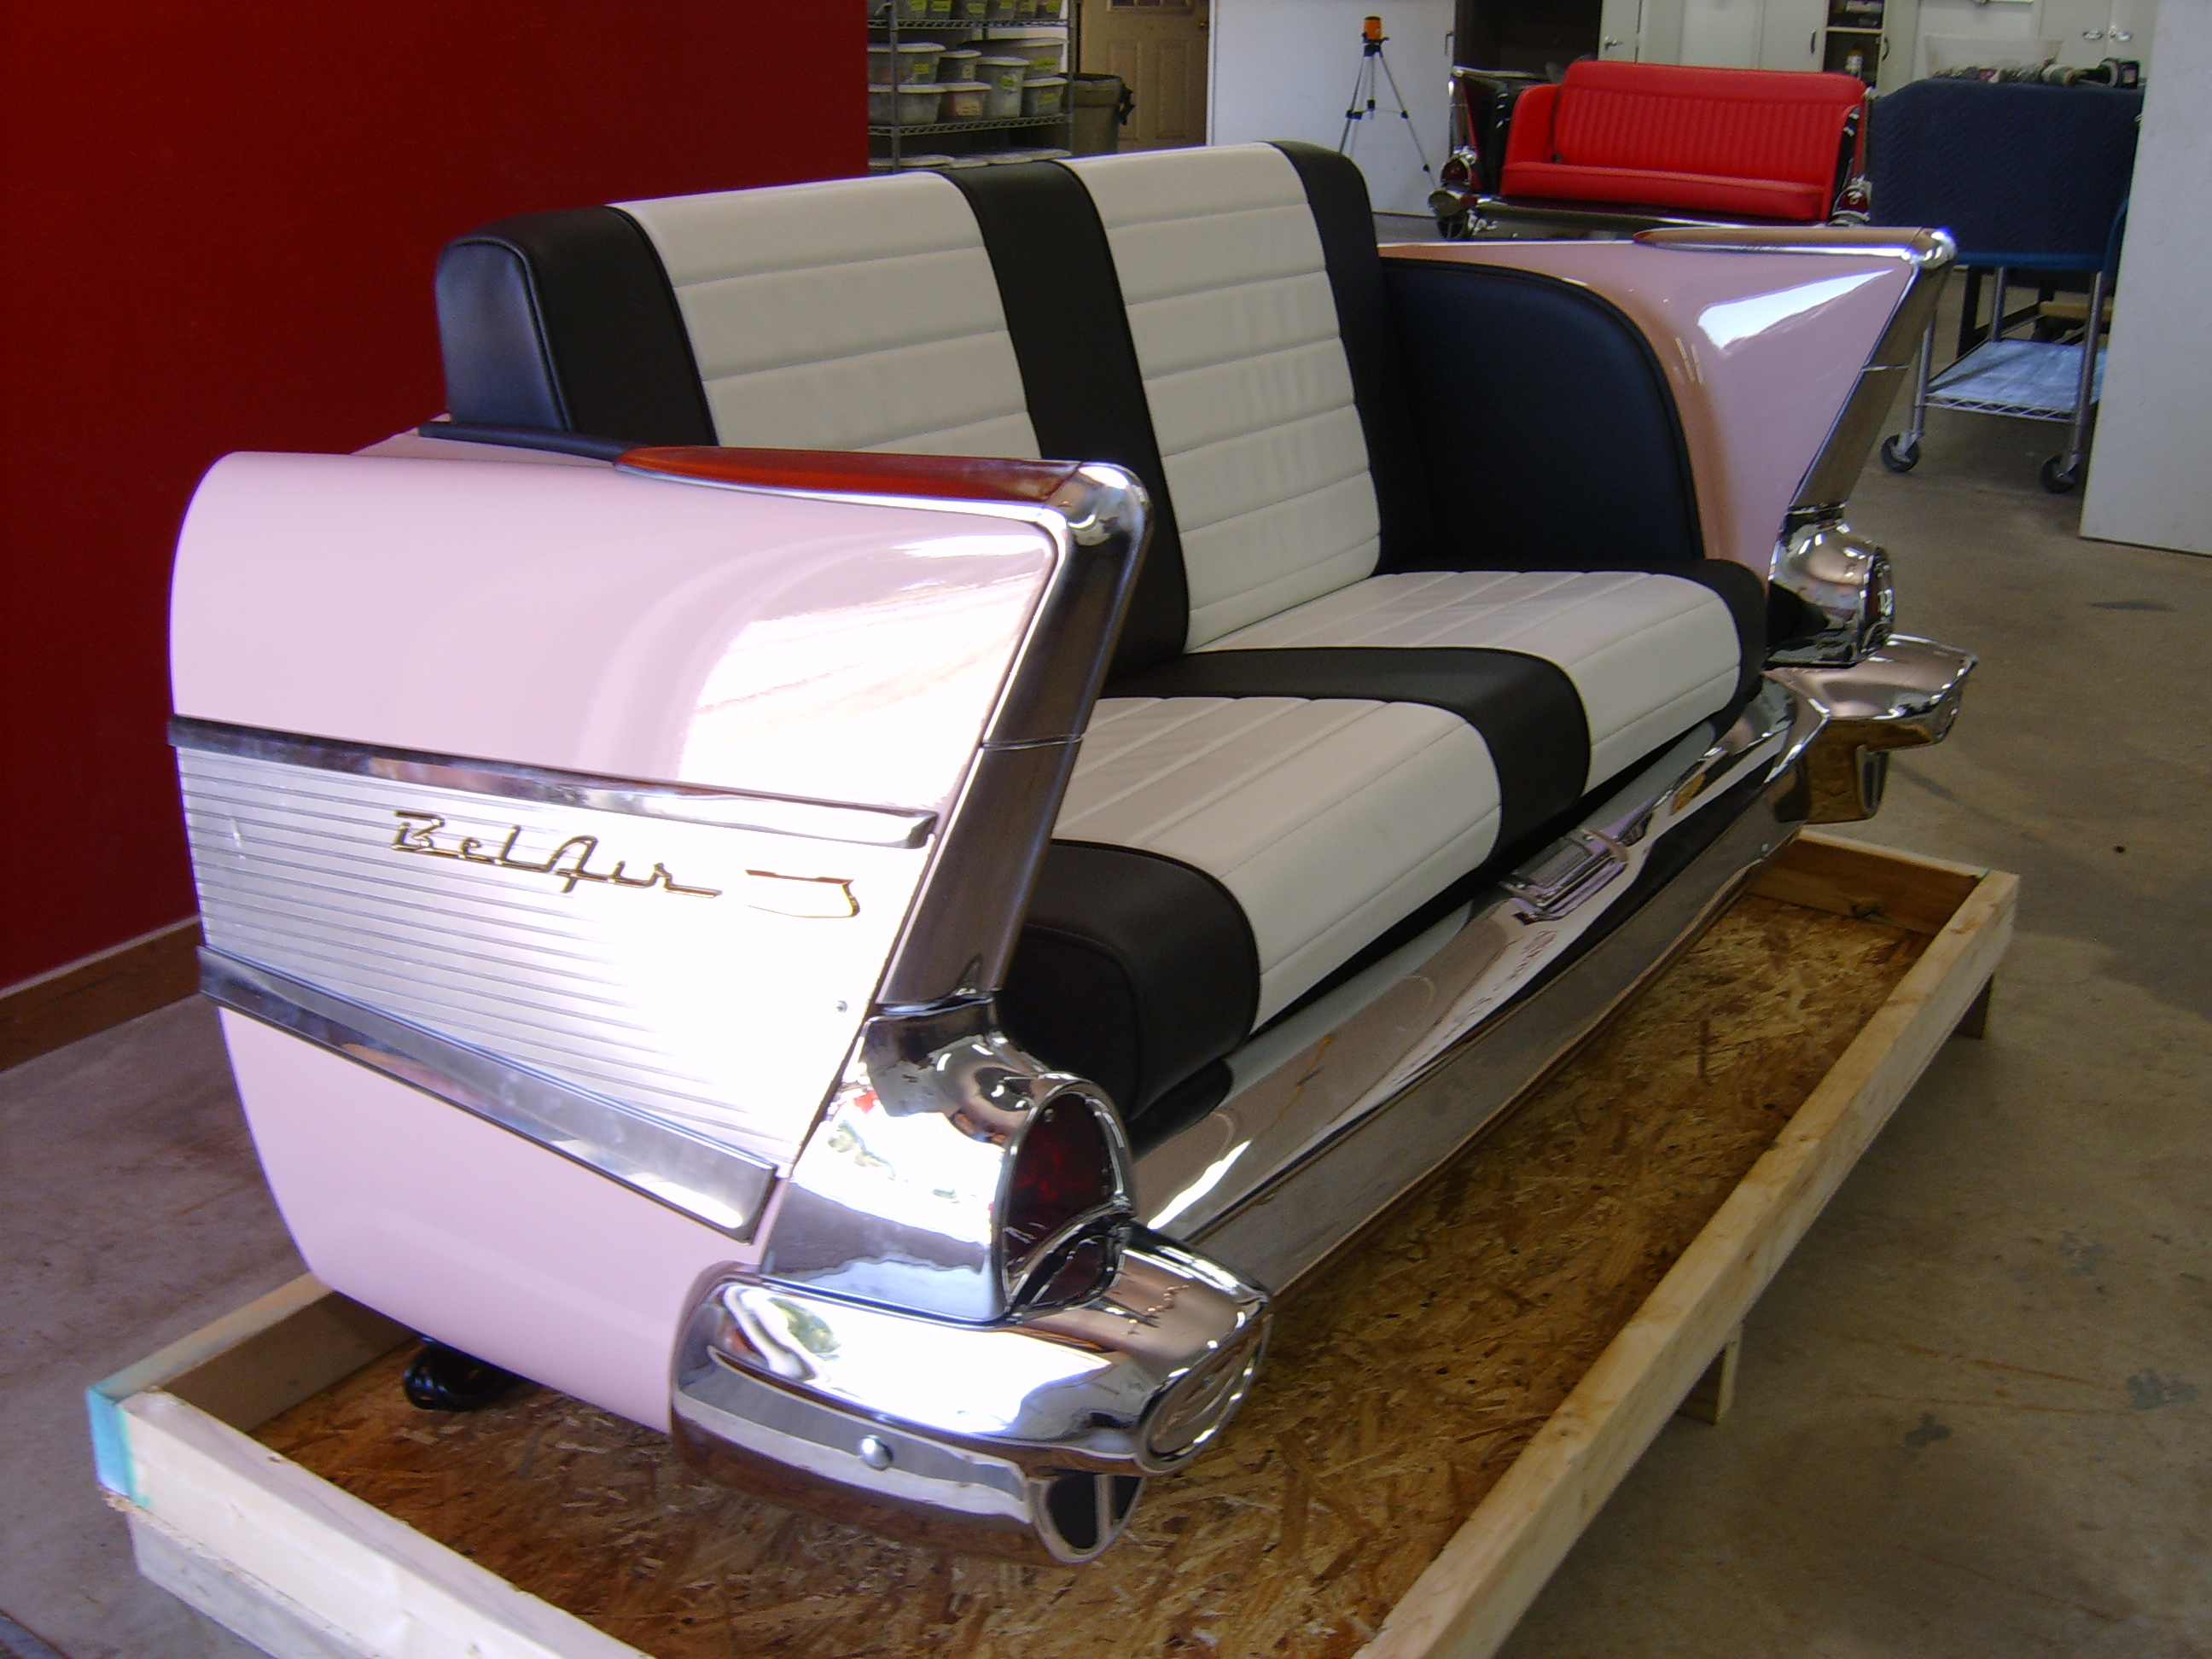 cars sofa chair elegant new retro restored classic car furniture and decor